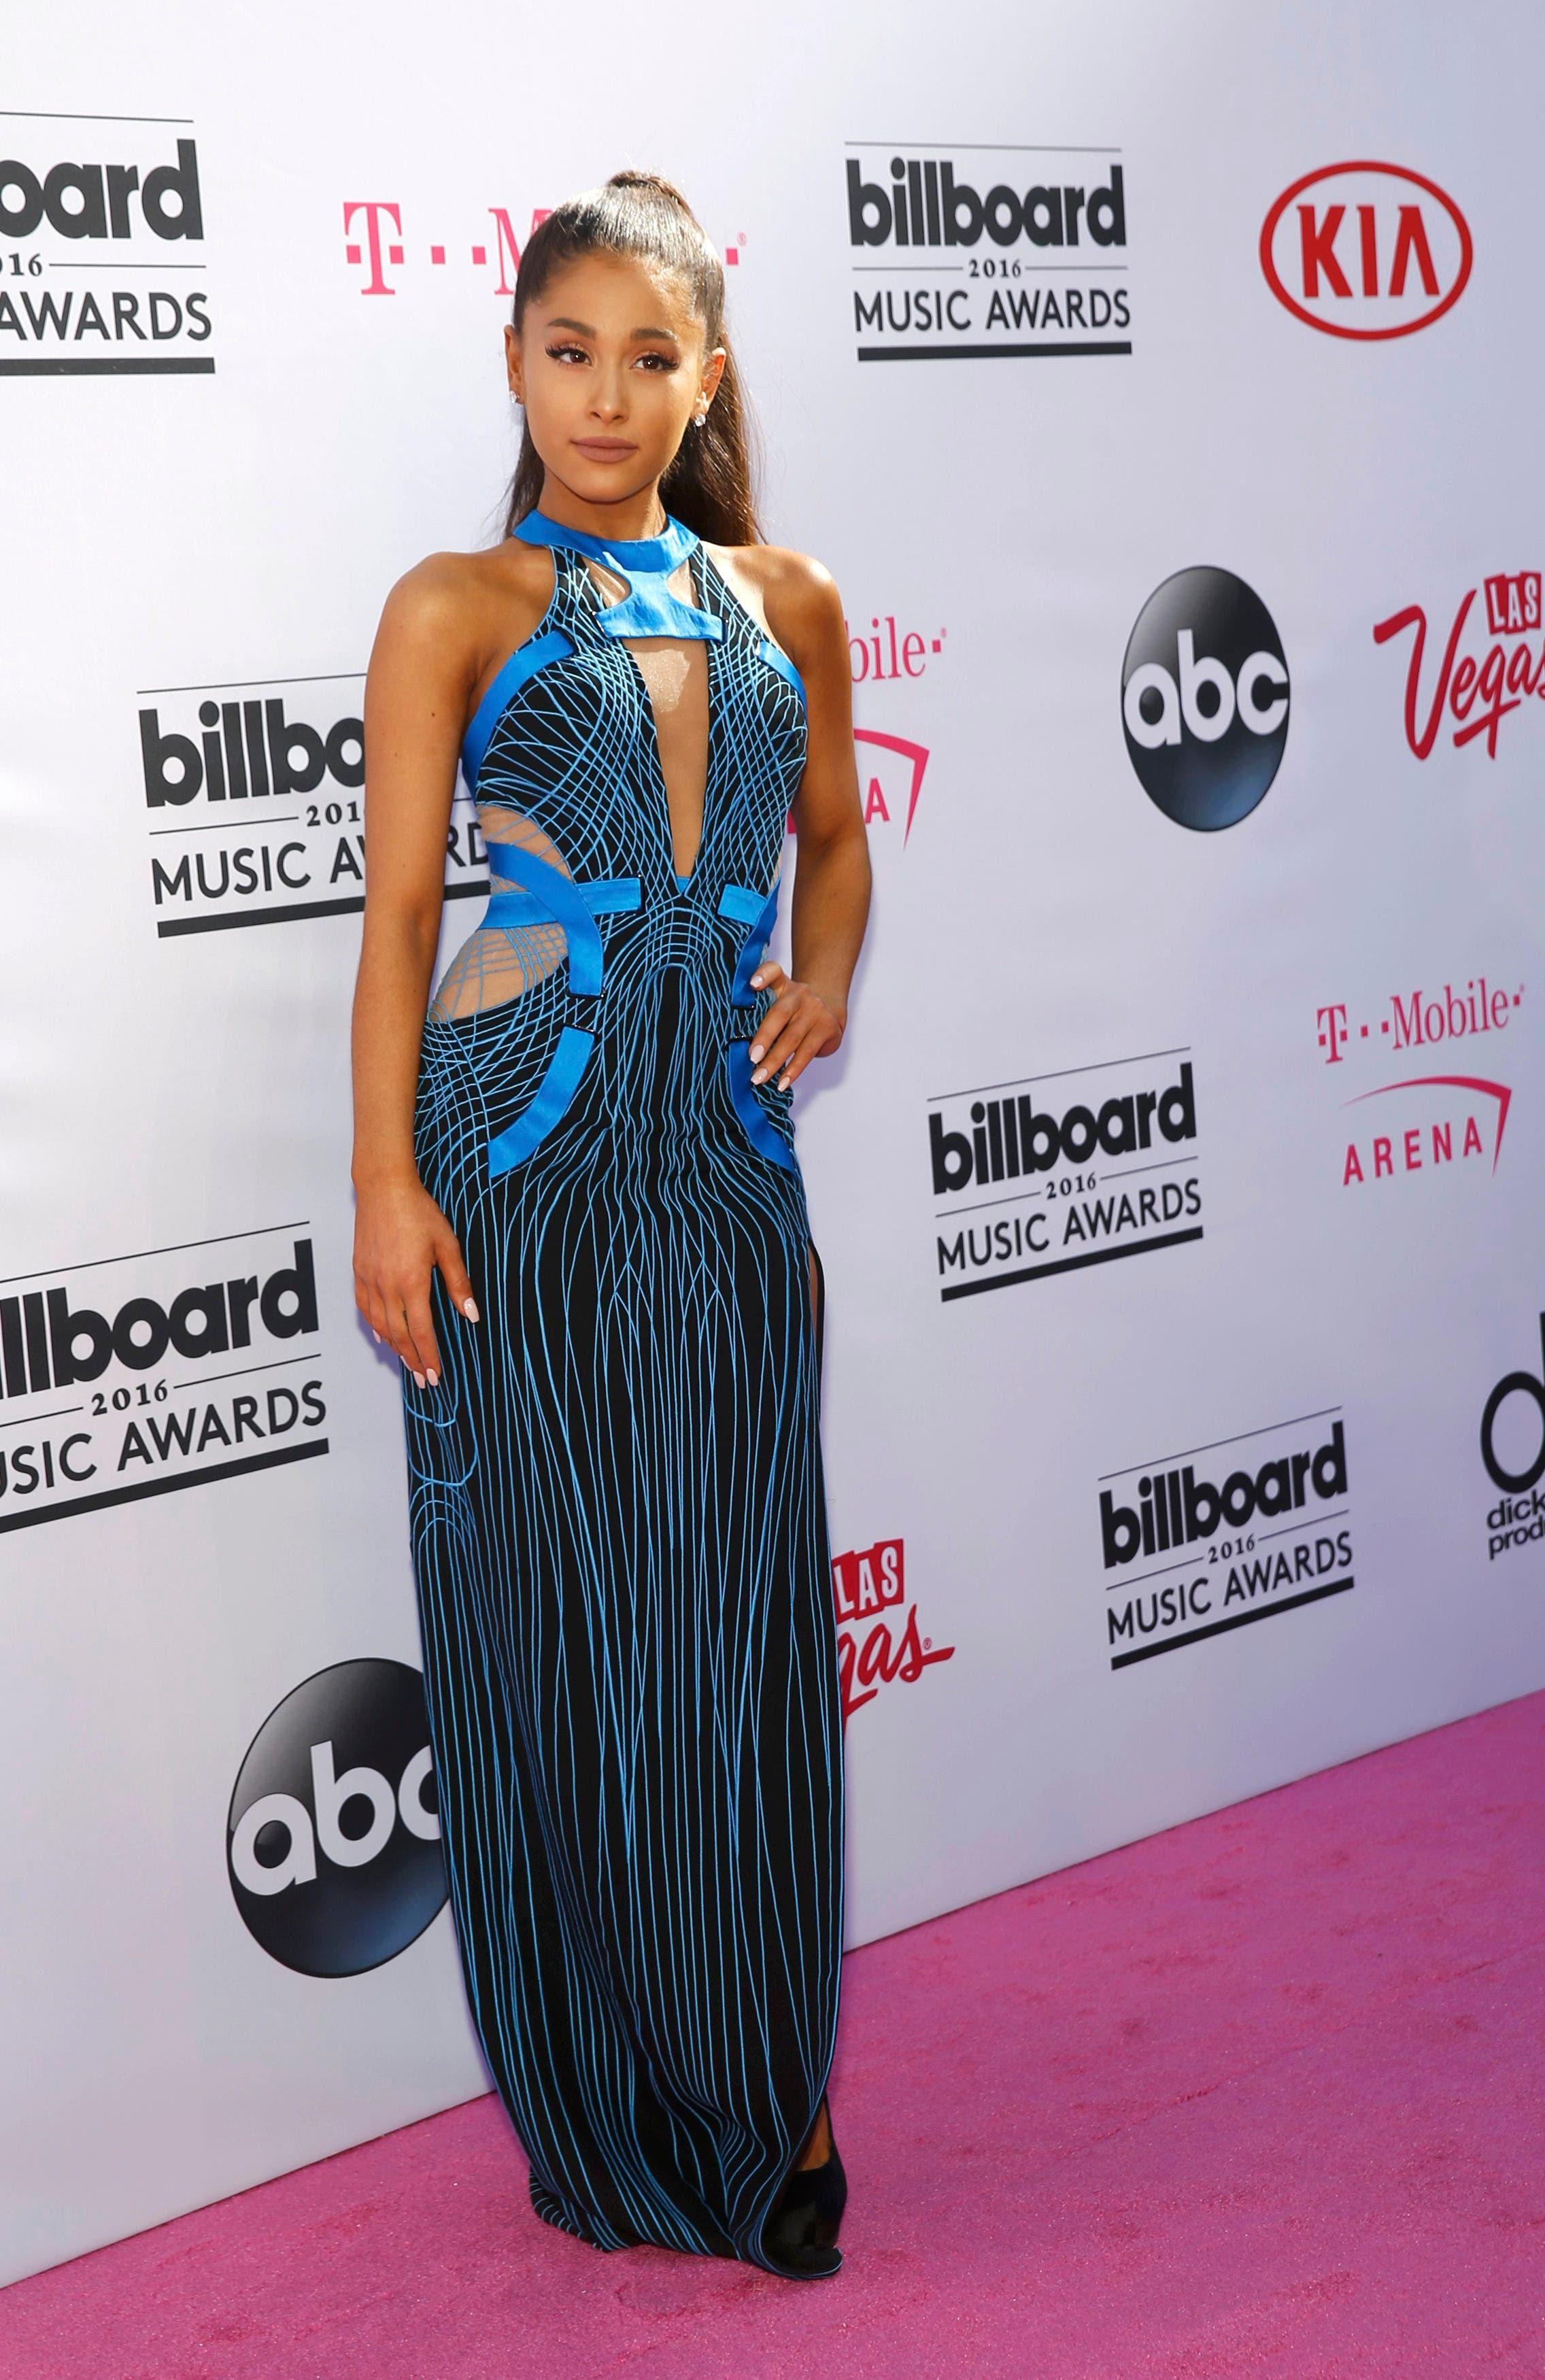 Singer Ariana Grande arrives at the 2016 Billboard Awards in Las Vegas, Nevada, US, May 22, 2016. (Reuters)